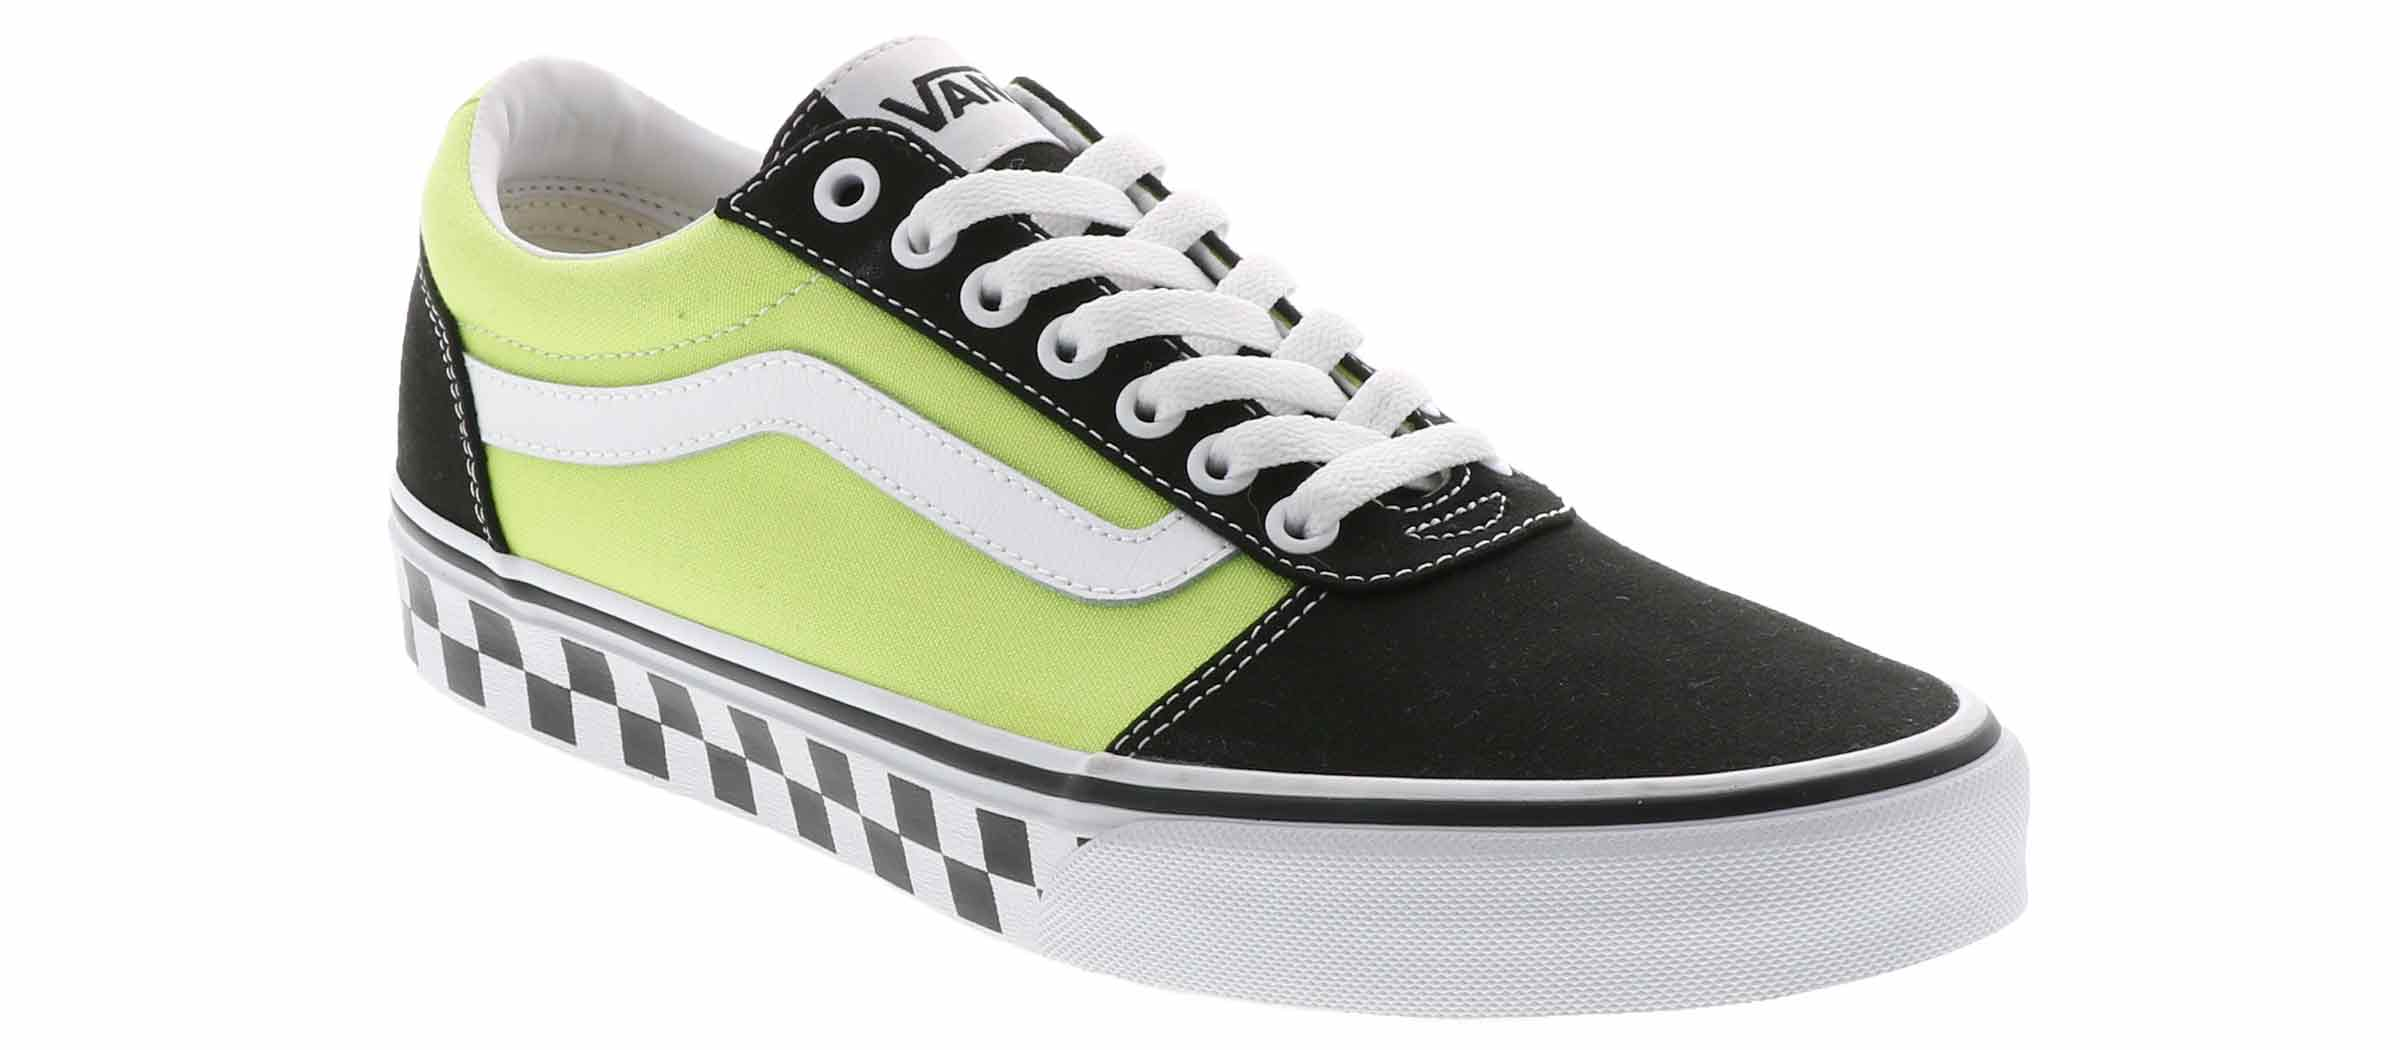 lime green high top vans